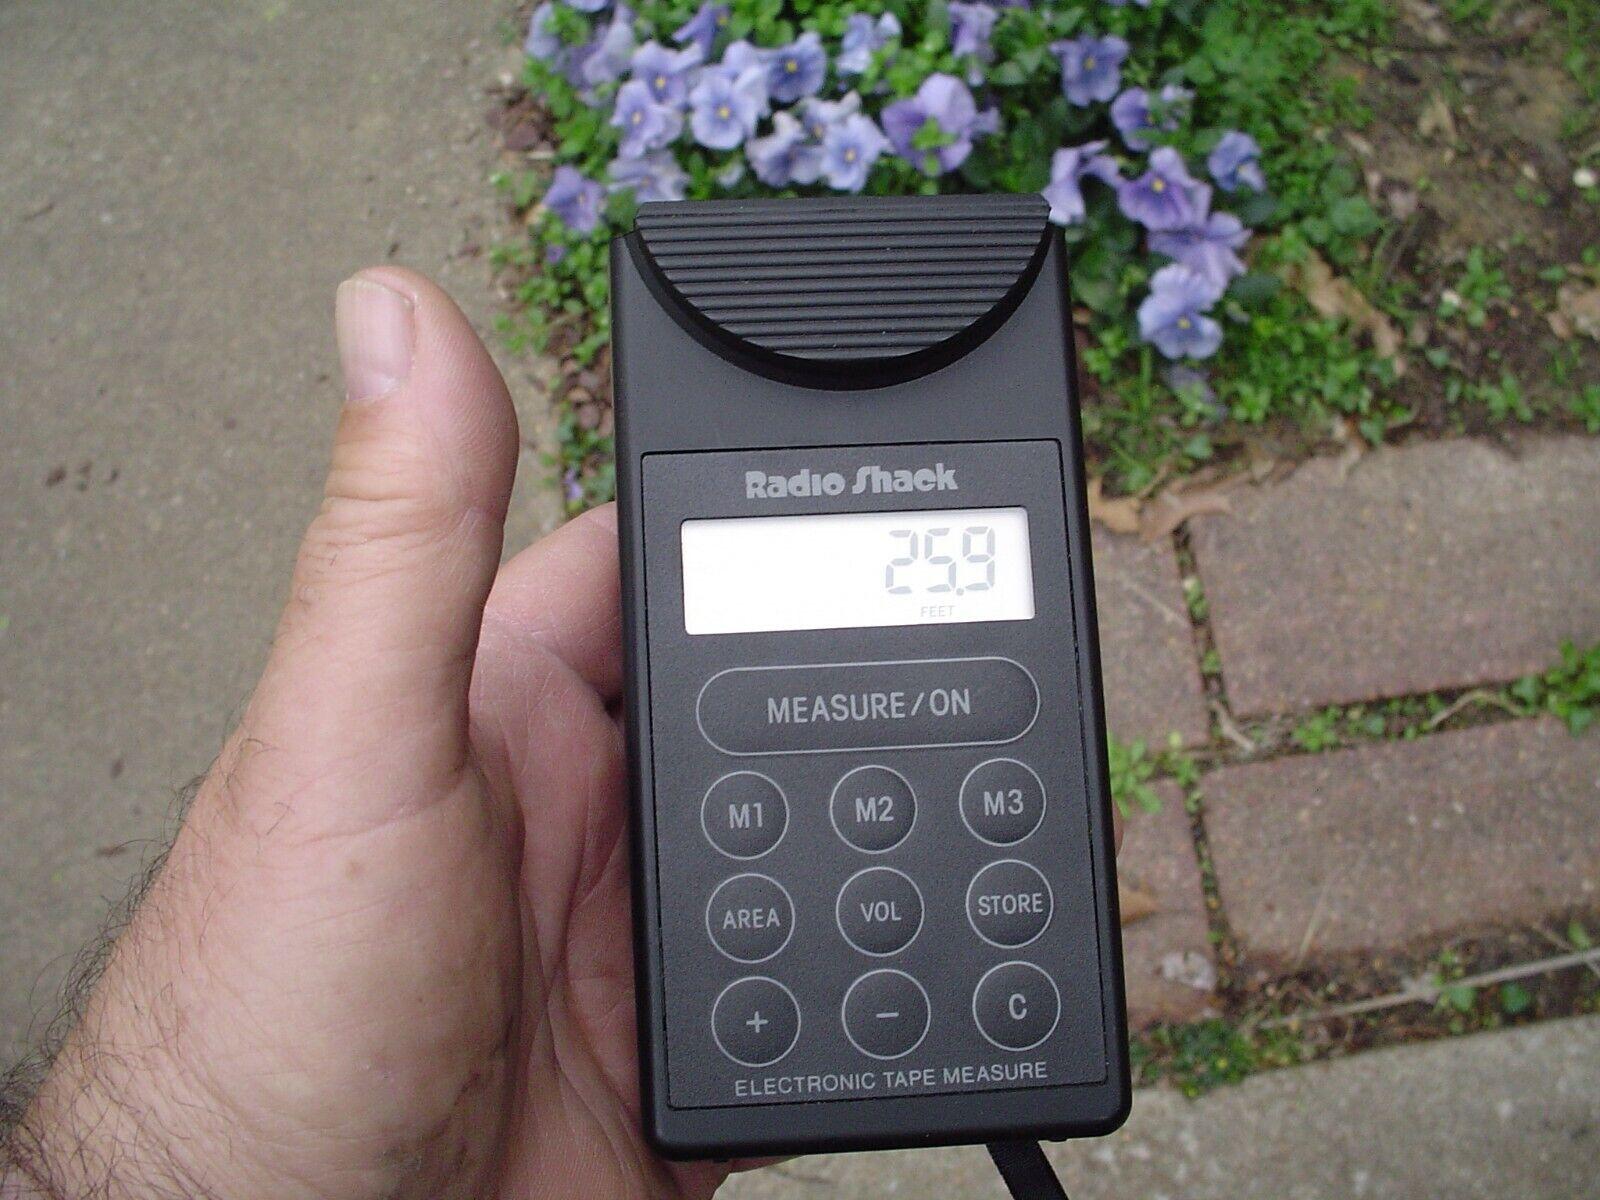 RADIO Shack Stile Smaltato RAME CALAMITA FILO BOBINA electromagnet 0.5 mm 24 Gauge